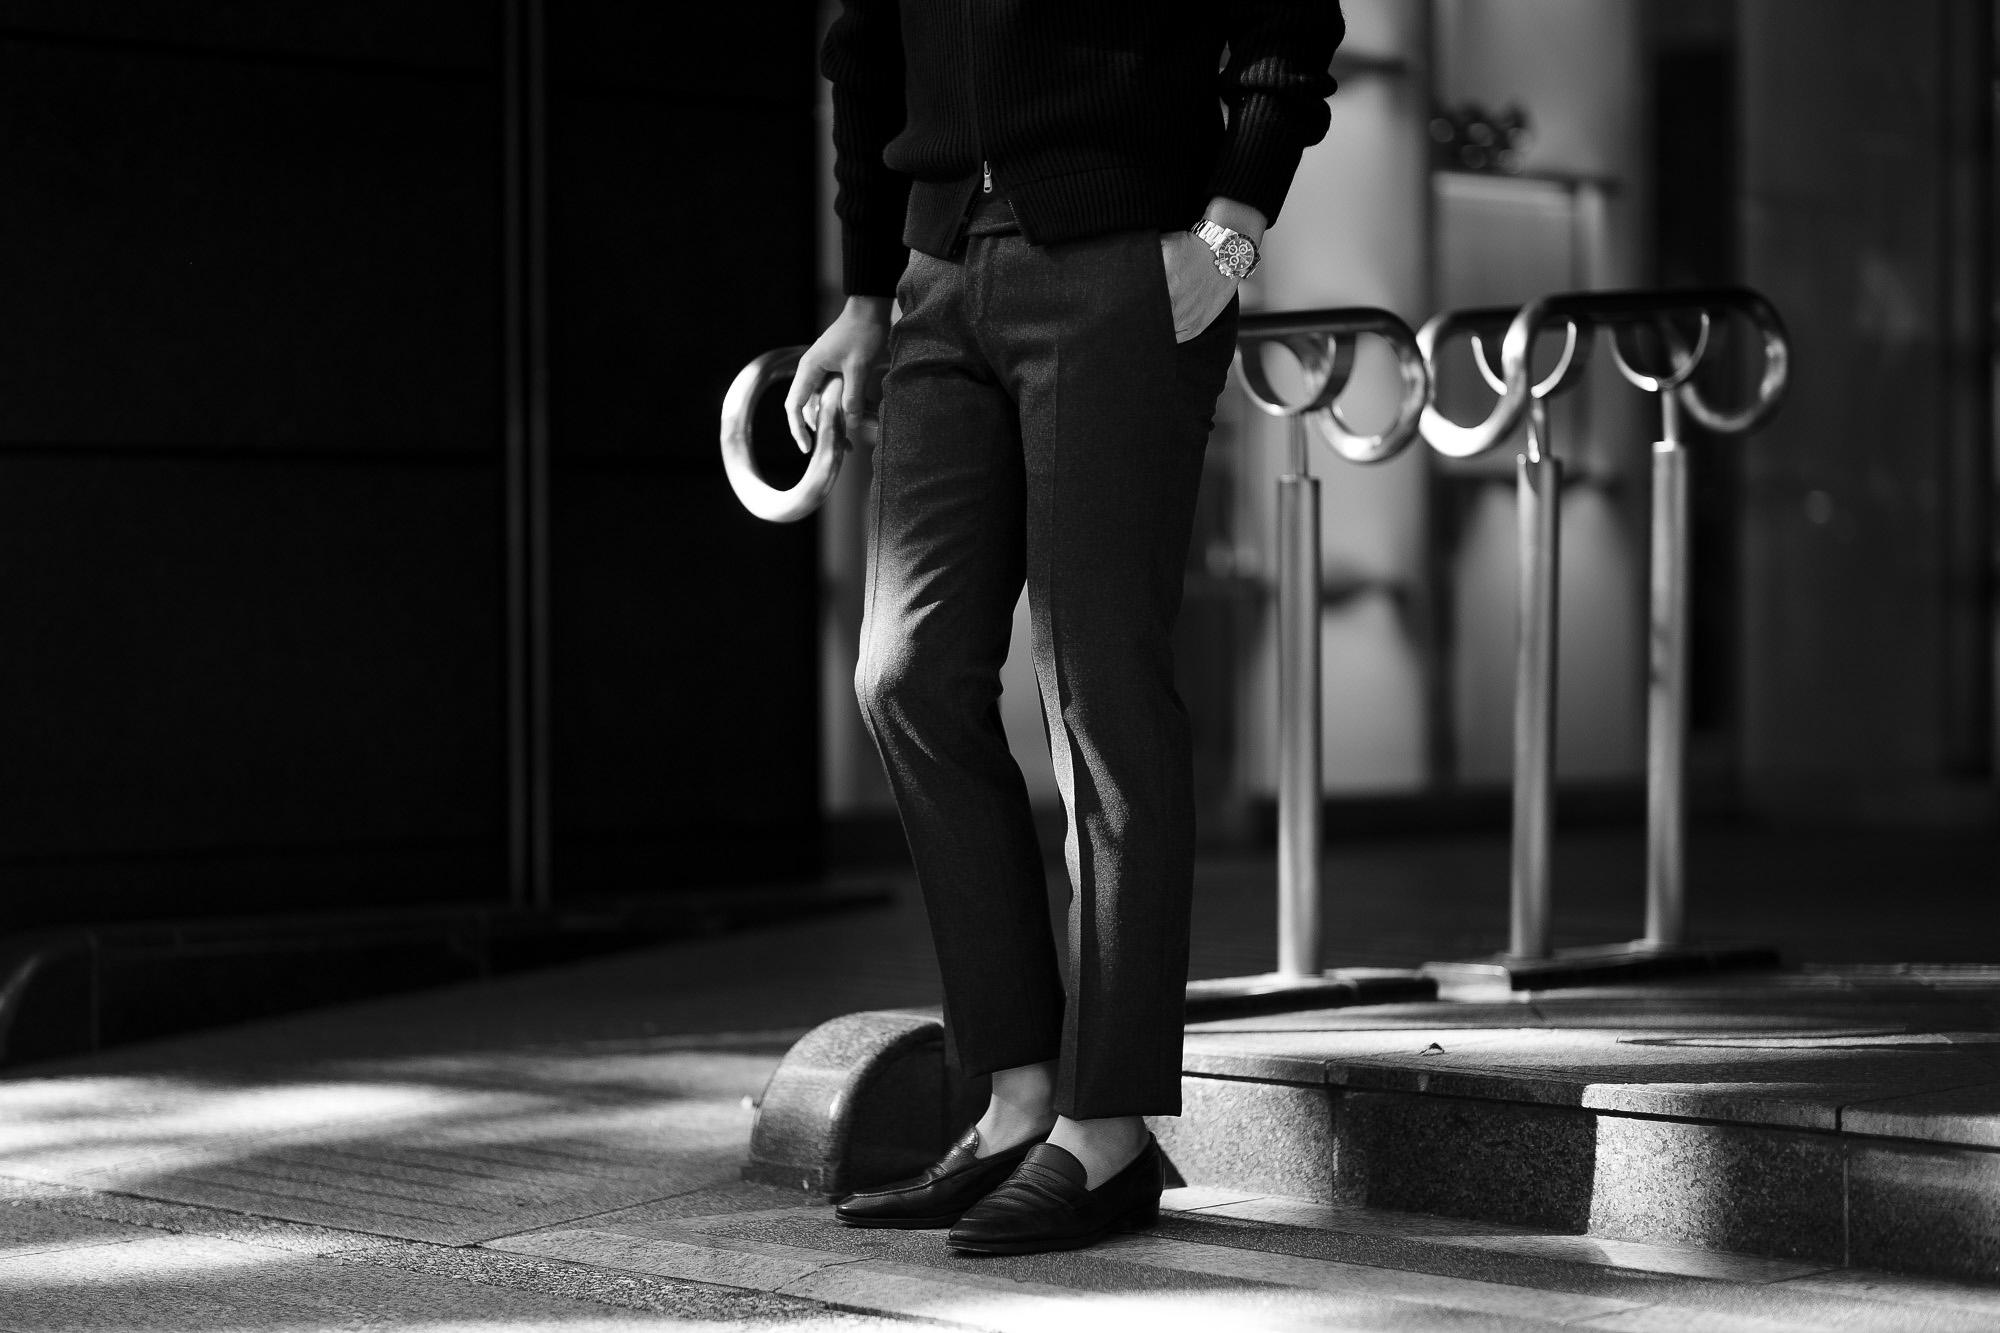 INCOTEX (インコテックス) N35 SLIM FIT (1T035R) URBAN TRAVELER (アーバントラベラー) TECHNO FLANNEL 撥水 ウォッシャブル ストレッチ フランネル ウール スラックス BLACK (ブラック・990) 2020 秋冬 【ご予約受付中】愛知 名古屋 altoediritto アルトエデリット